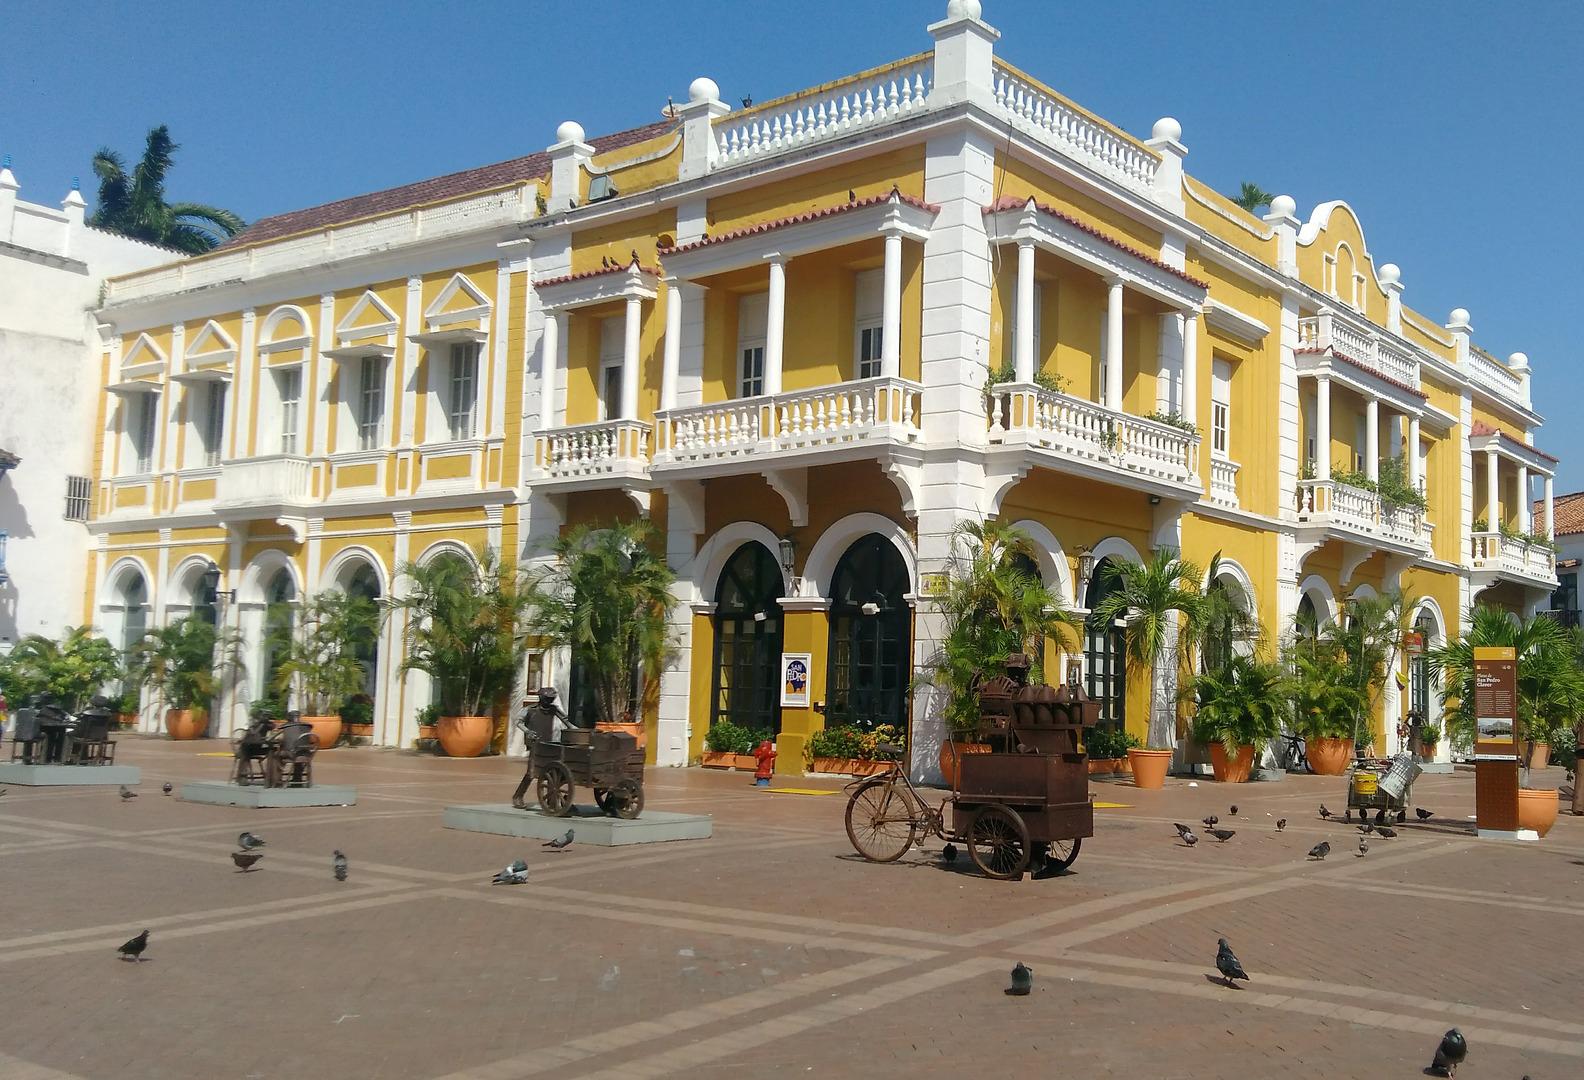 Air Canada Vacations adds Cartagena